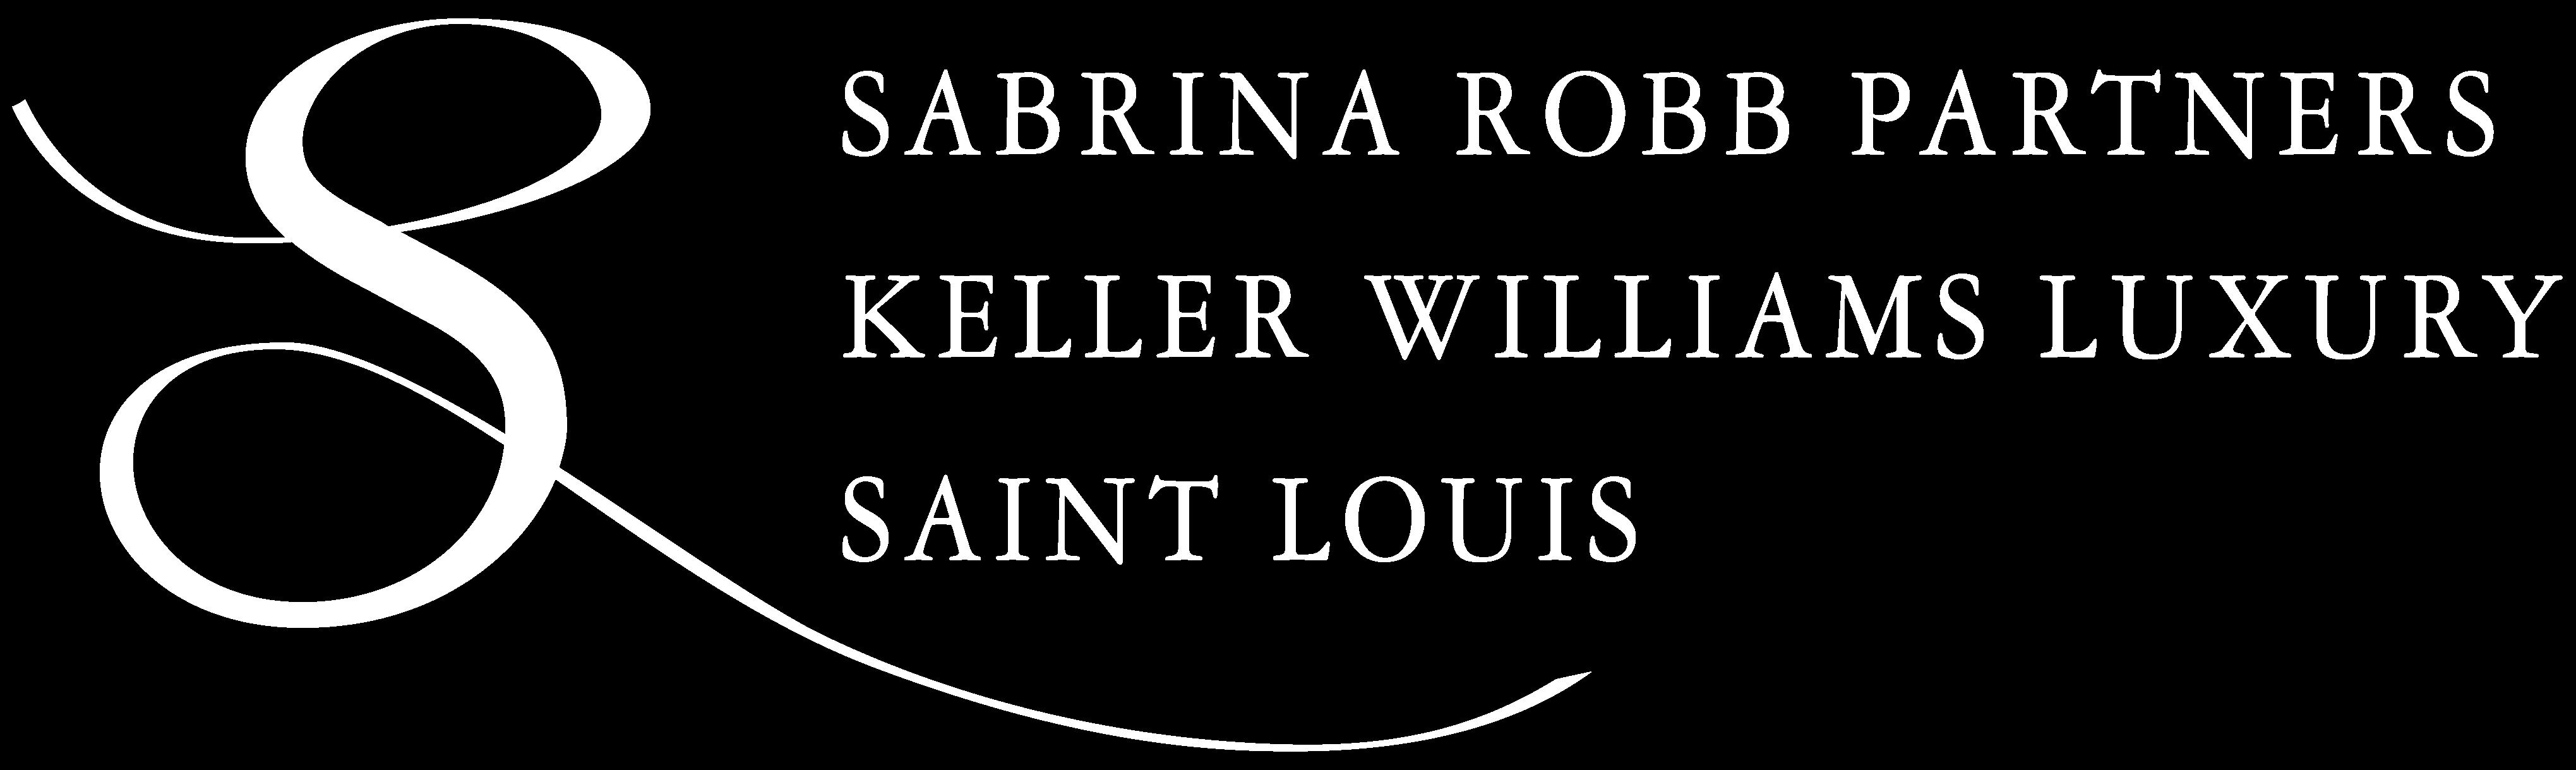 Sabrina Robb Partners